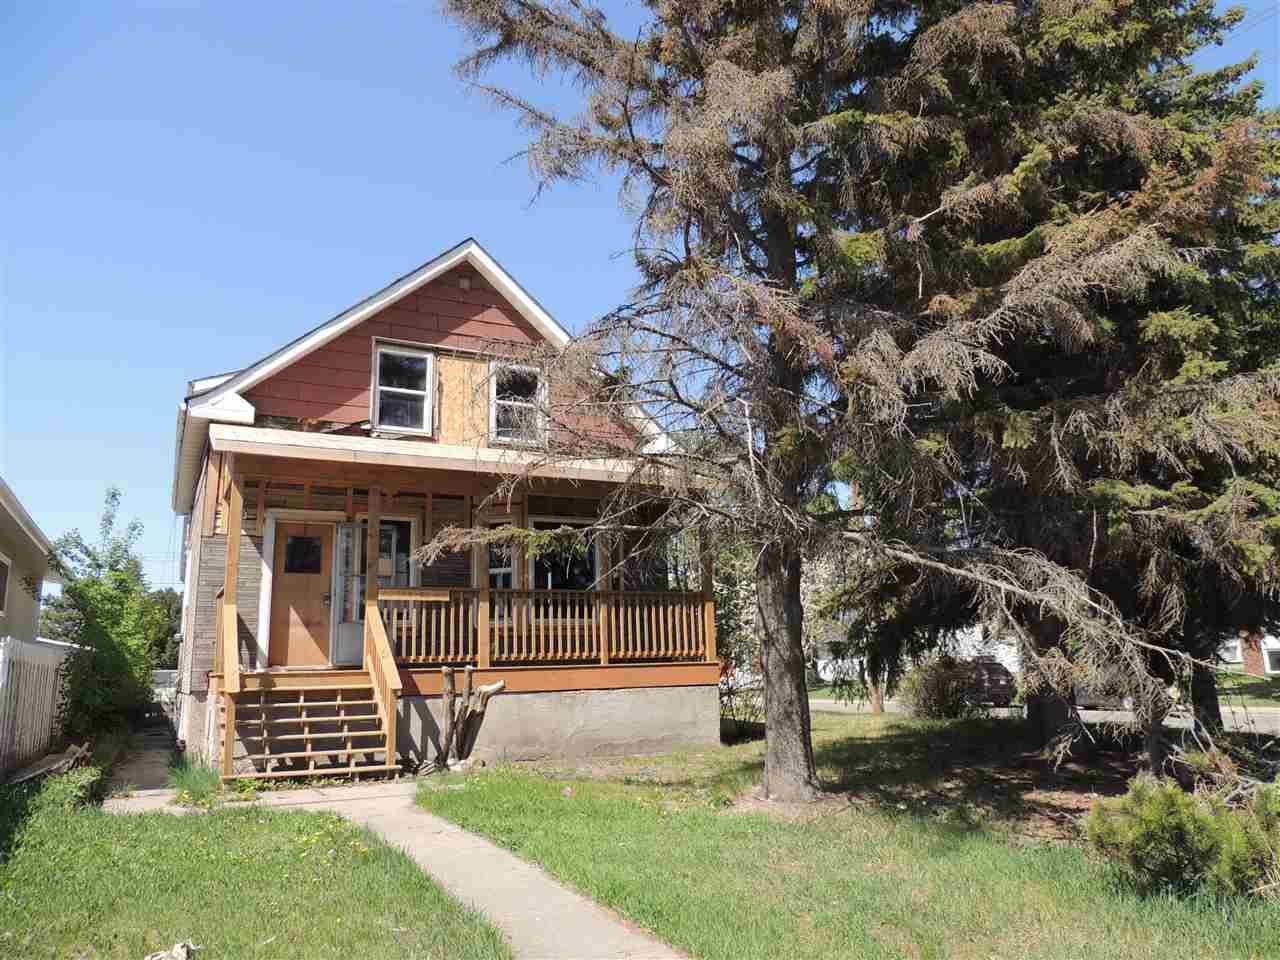 Property, 4 bed, at $199,900